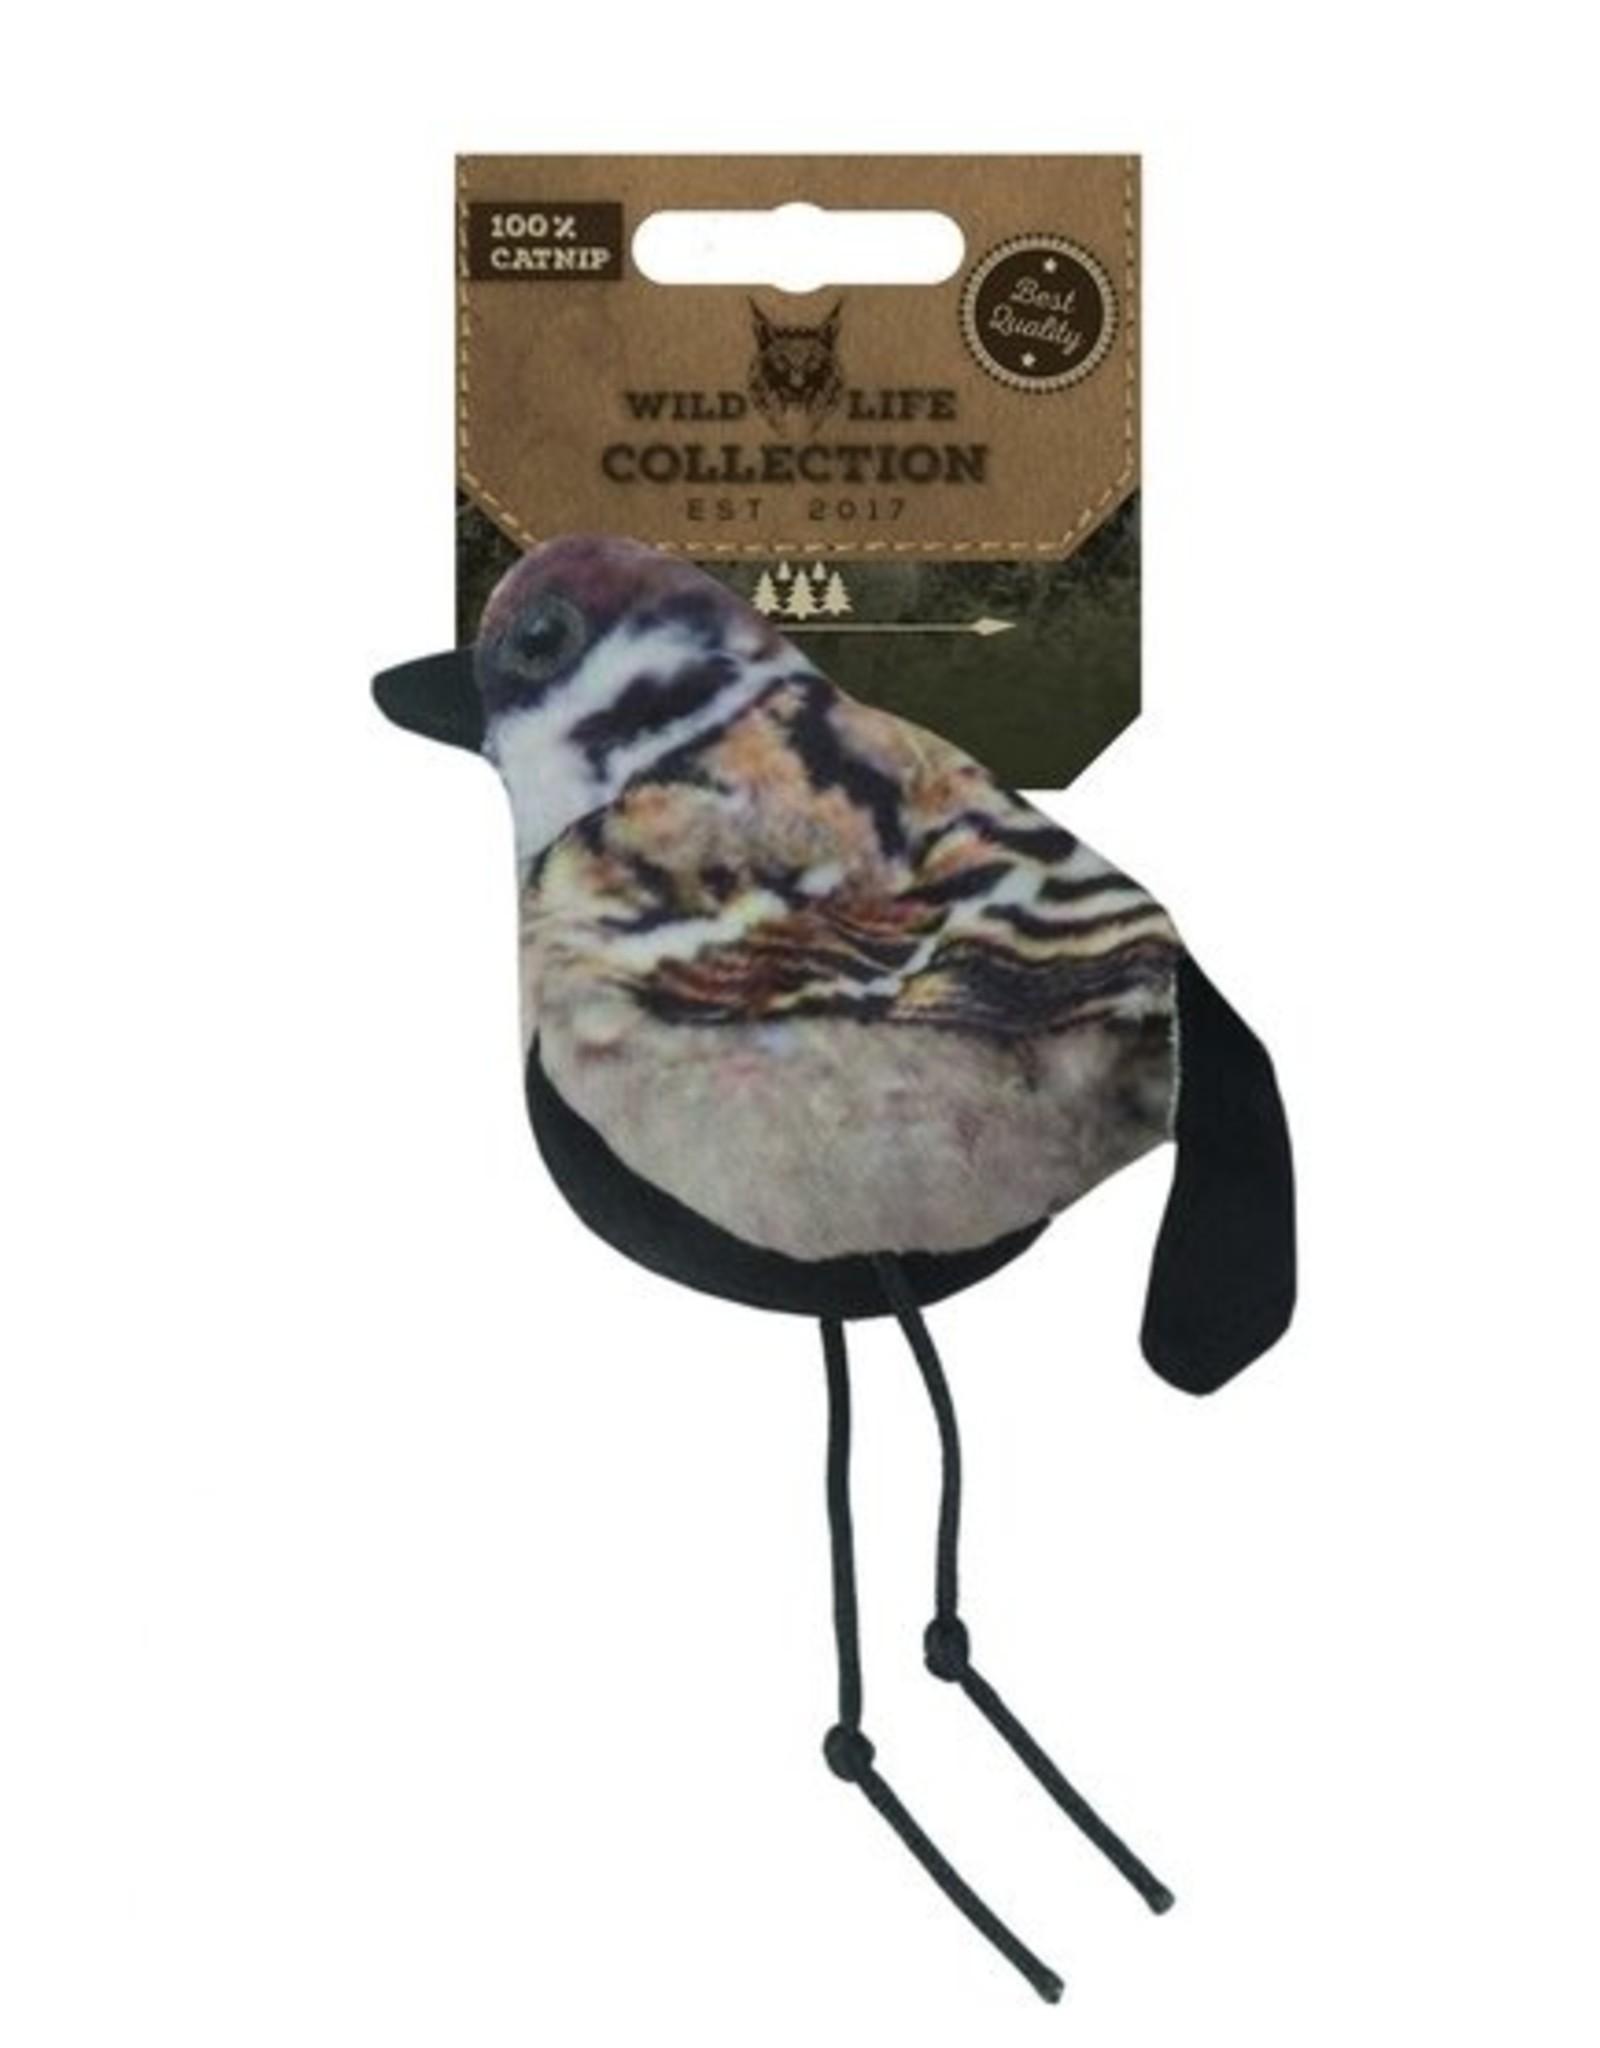 Wild Life Cat - Sparrow